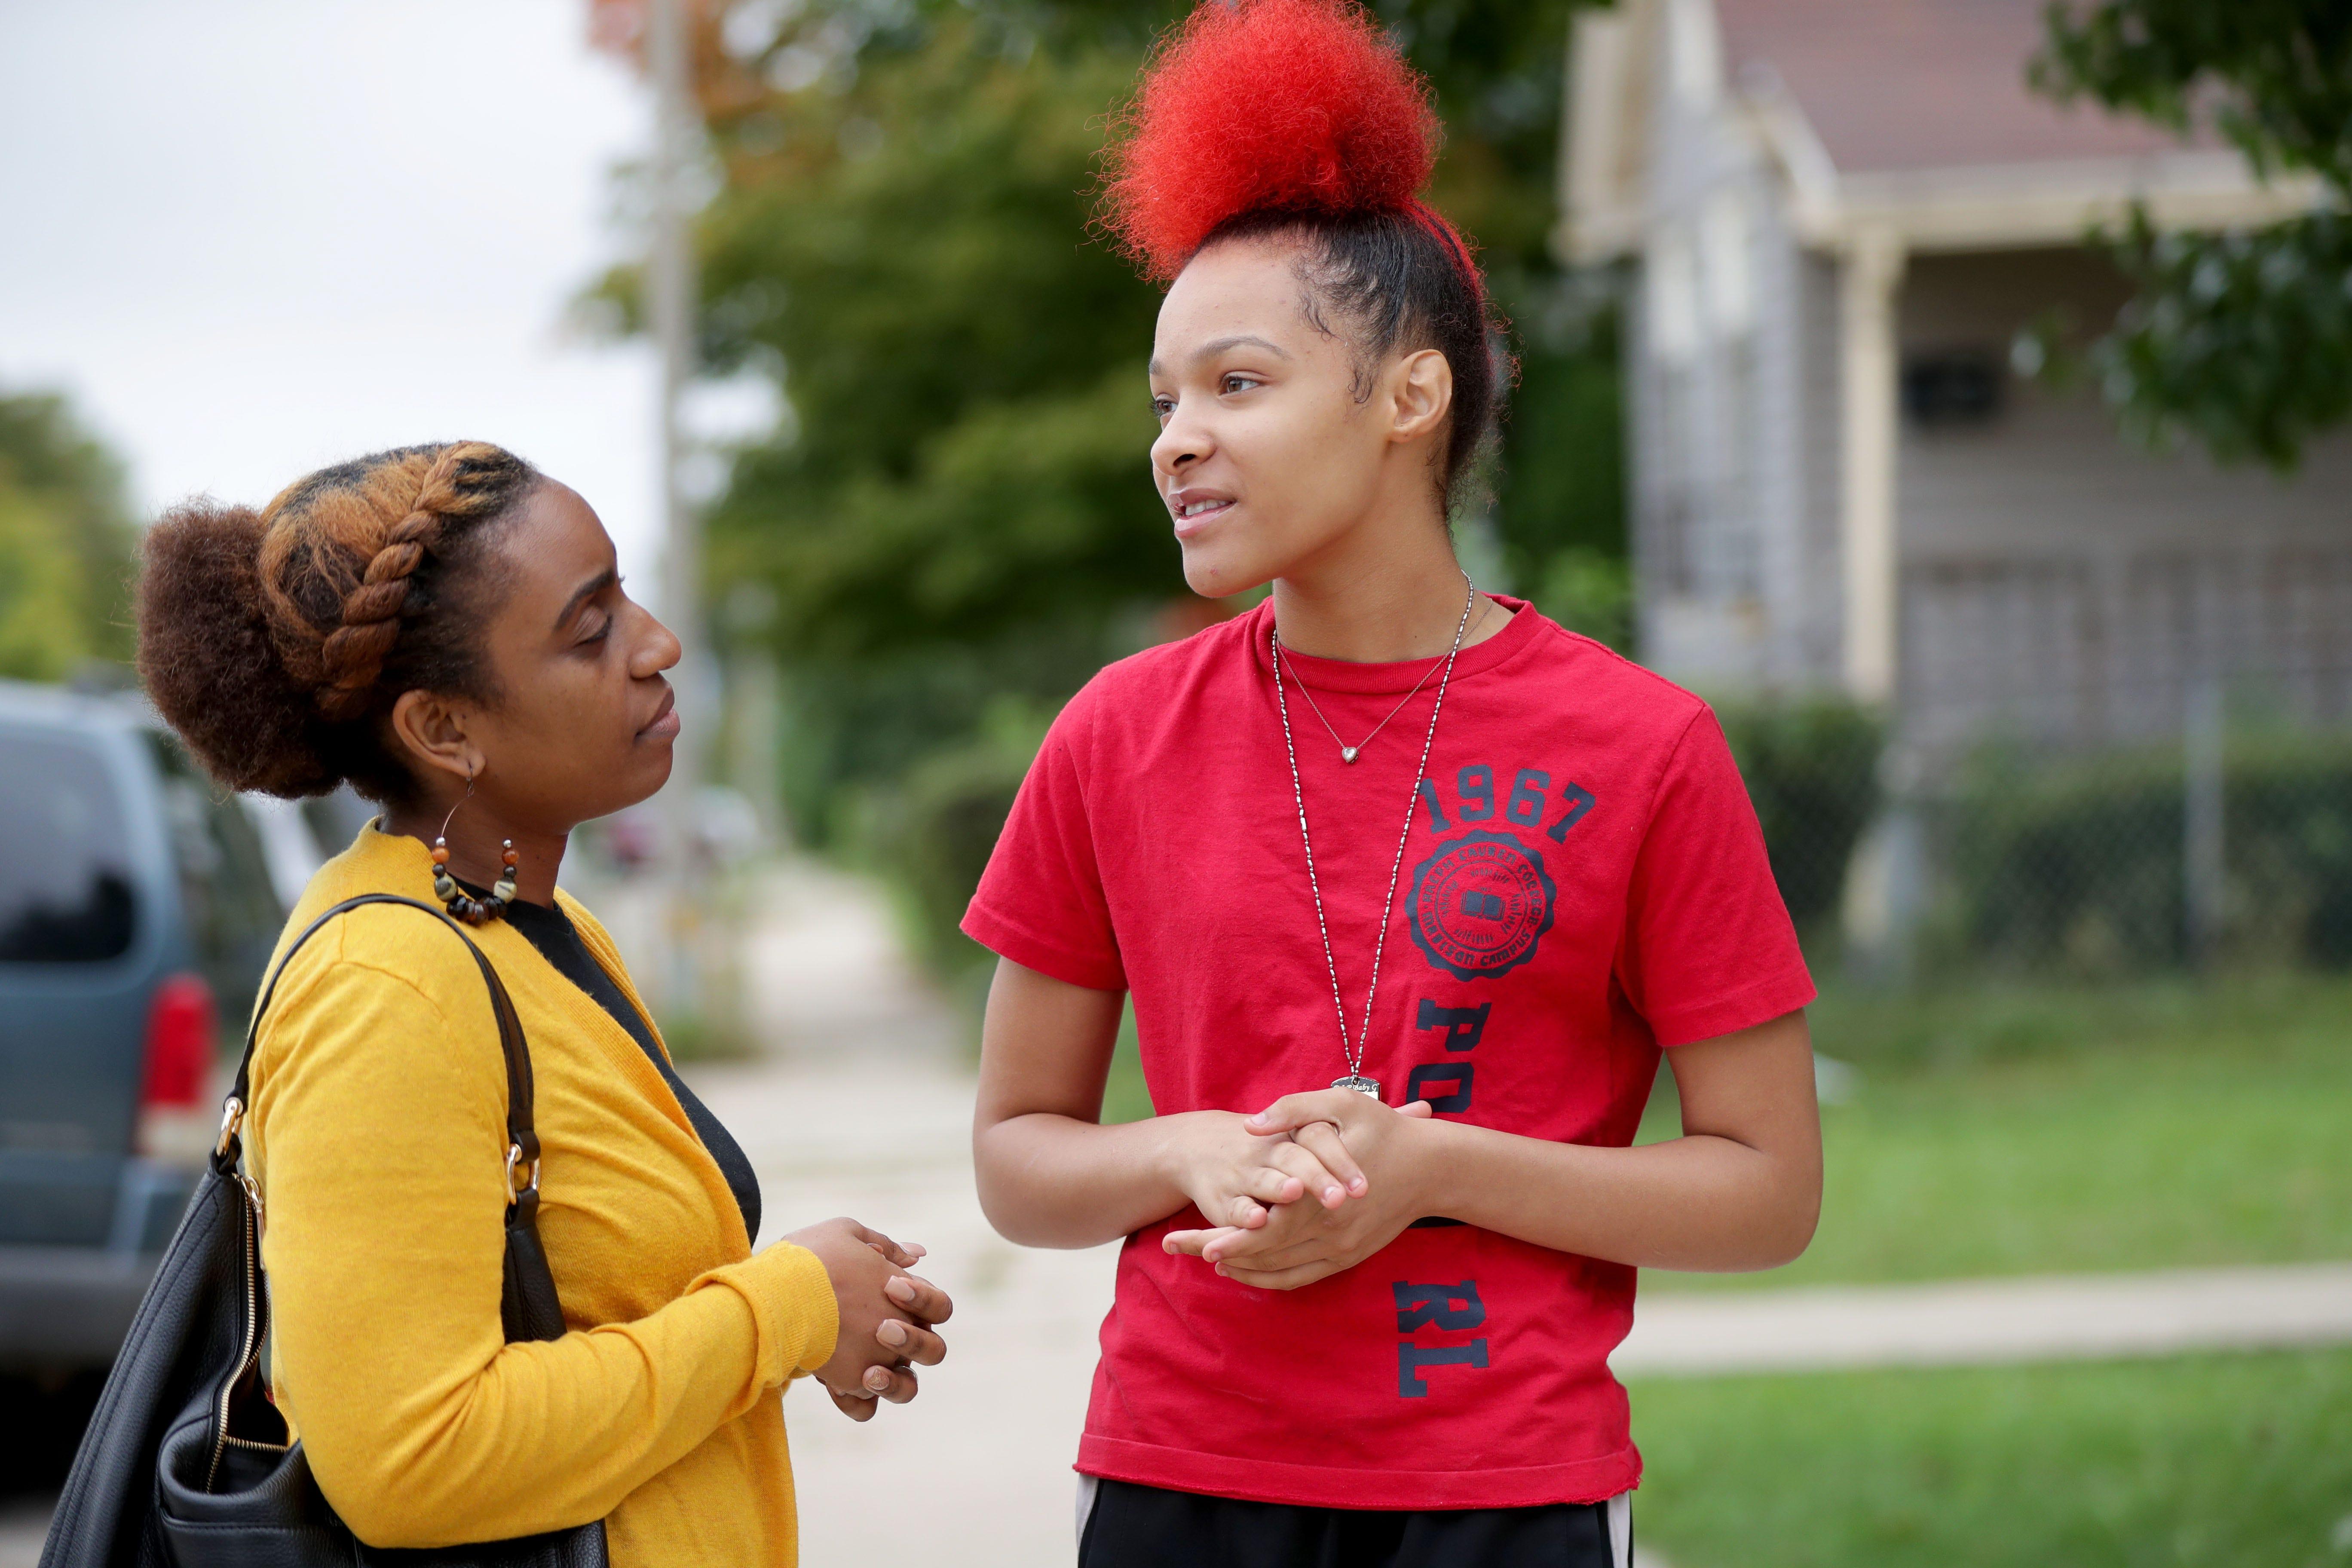 Teens create public service announcement warning of dangers of carjacking | Milwaukee Journal Sentinel